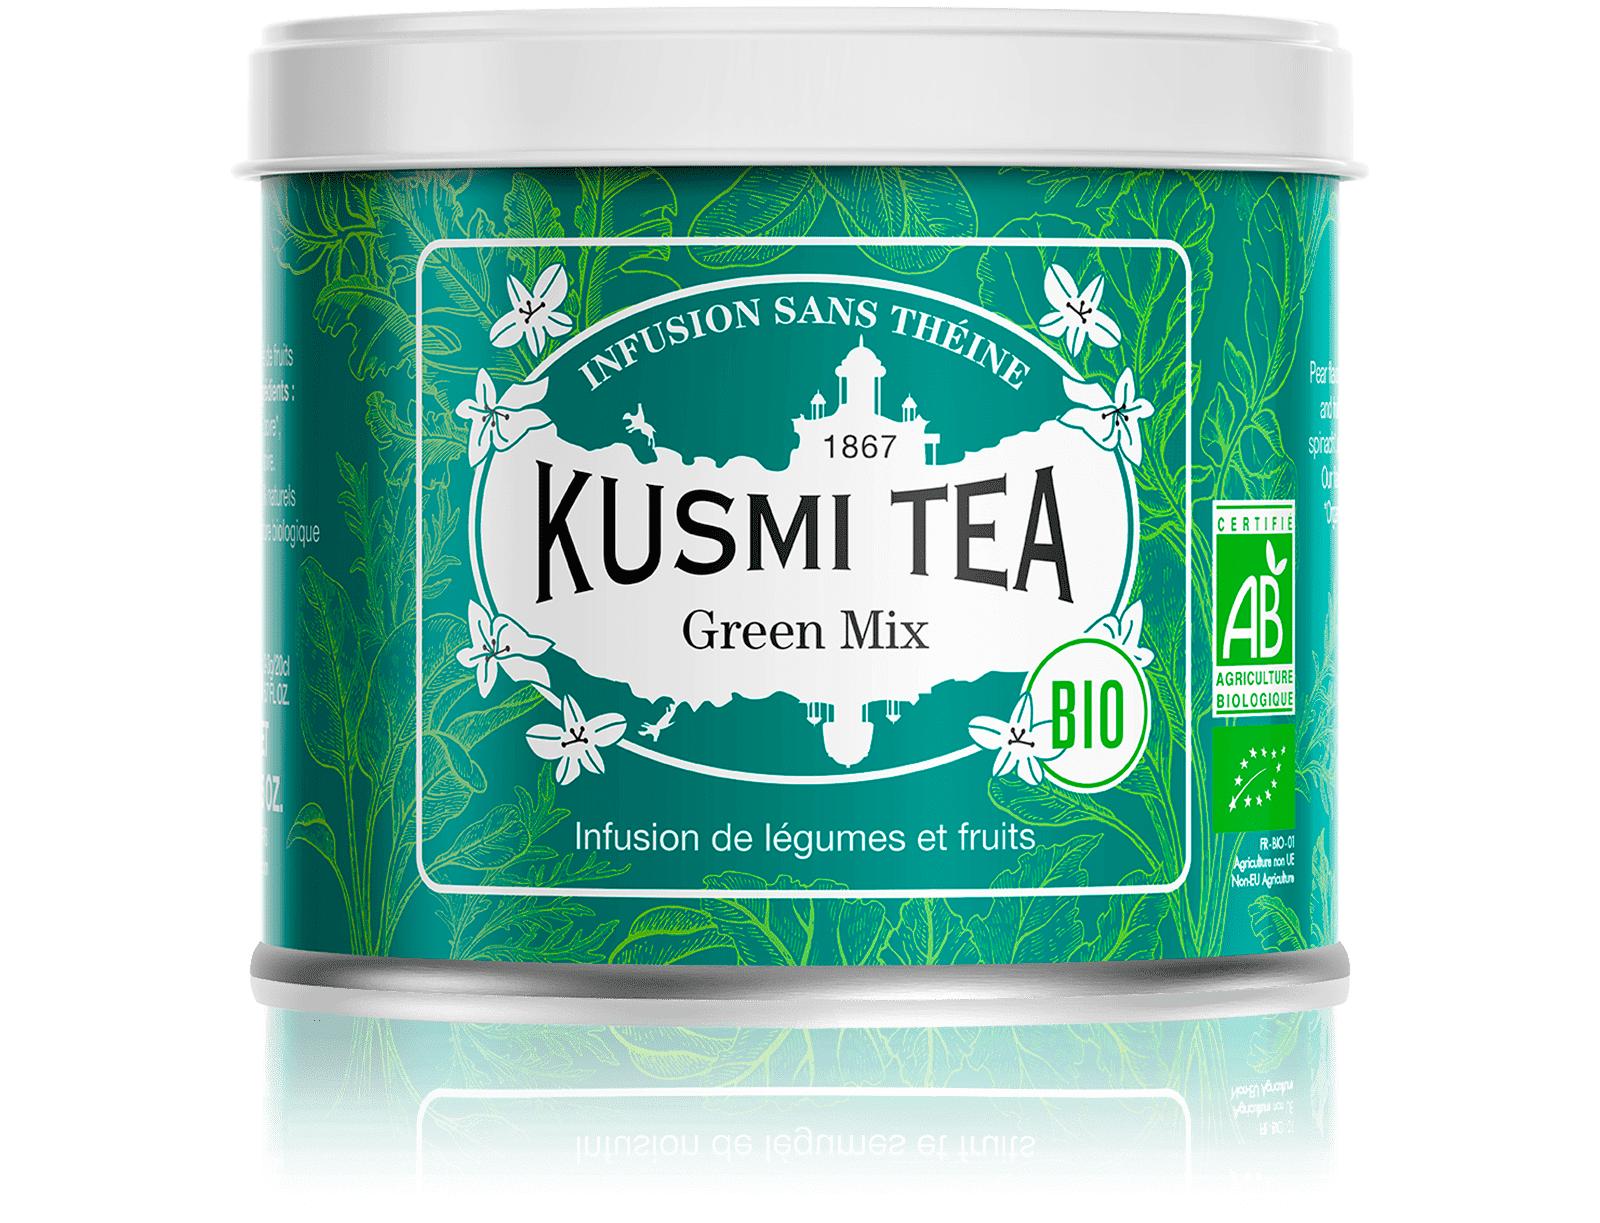 KUSMI TEA Green Mix (Infusion bio) - Infusion de légumes et de fruits - Kusmi Tea